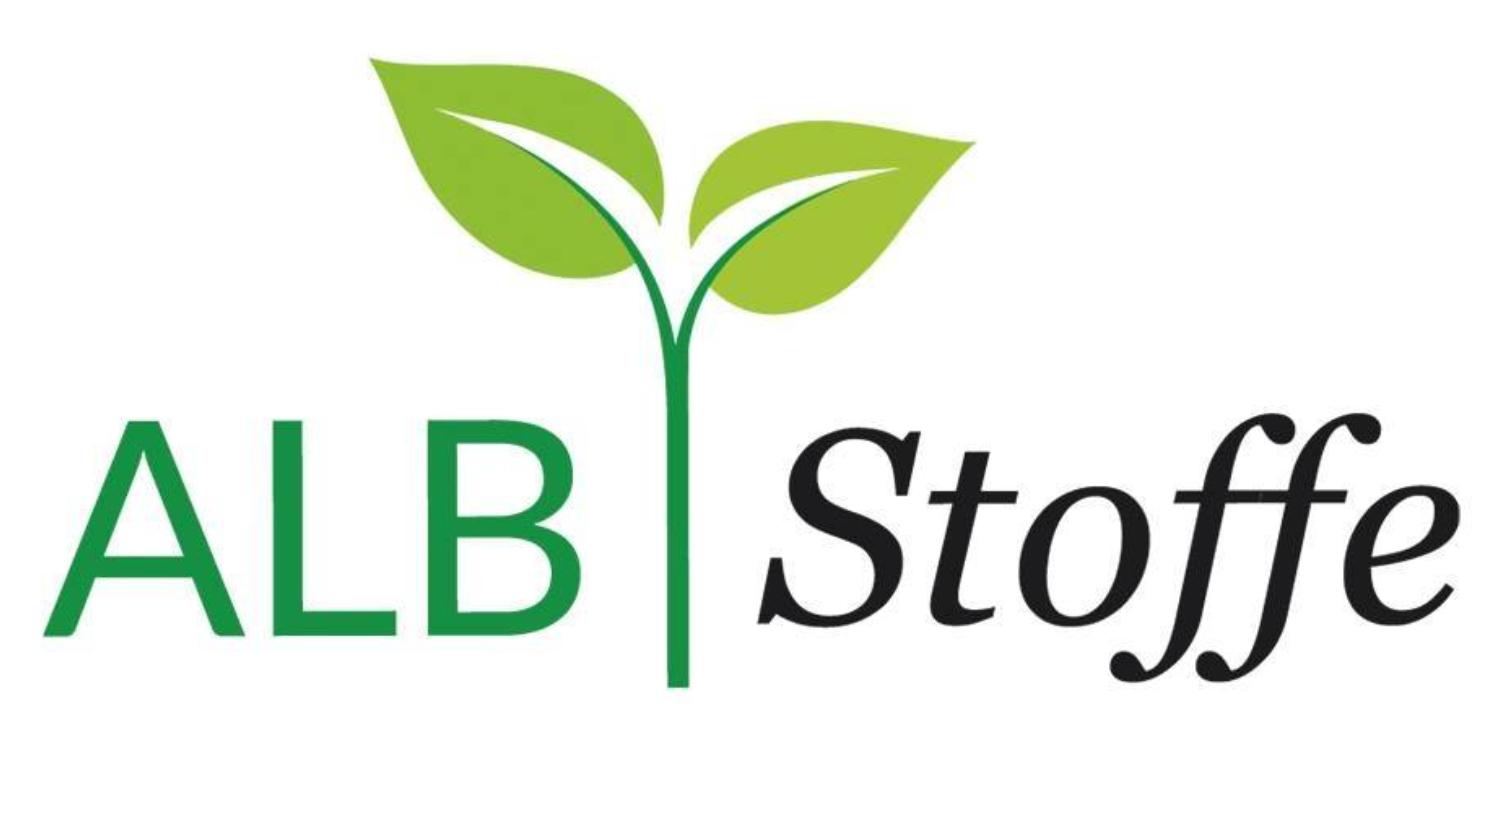 Albstoffe Logo